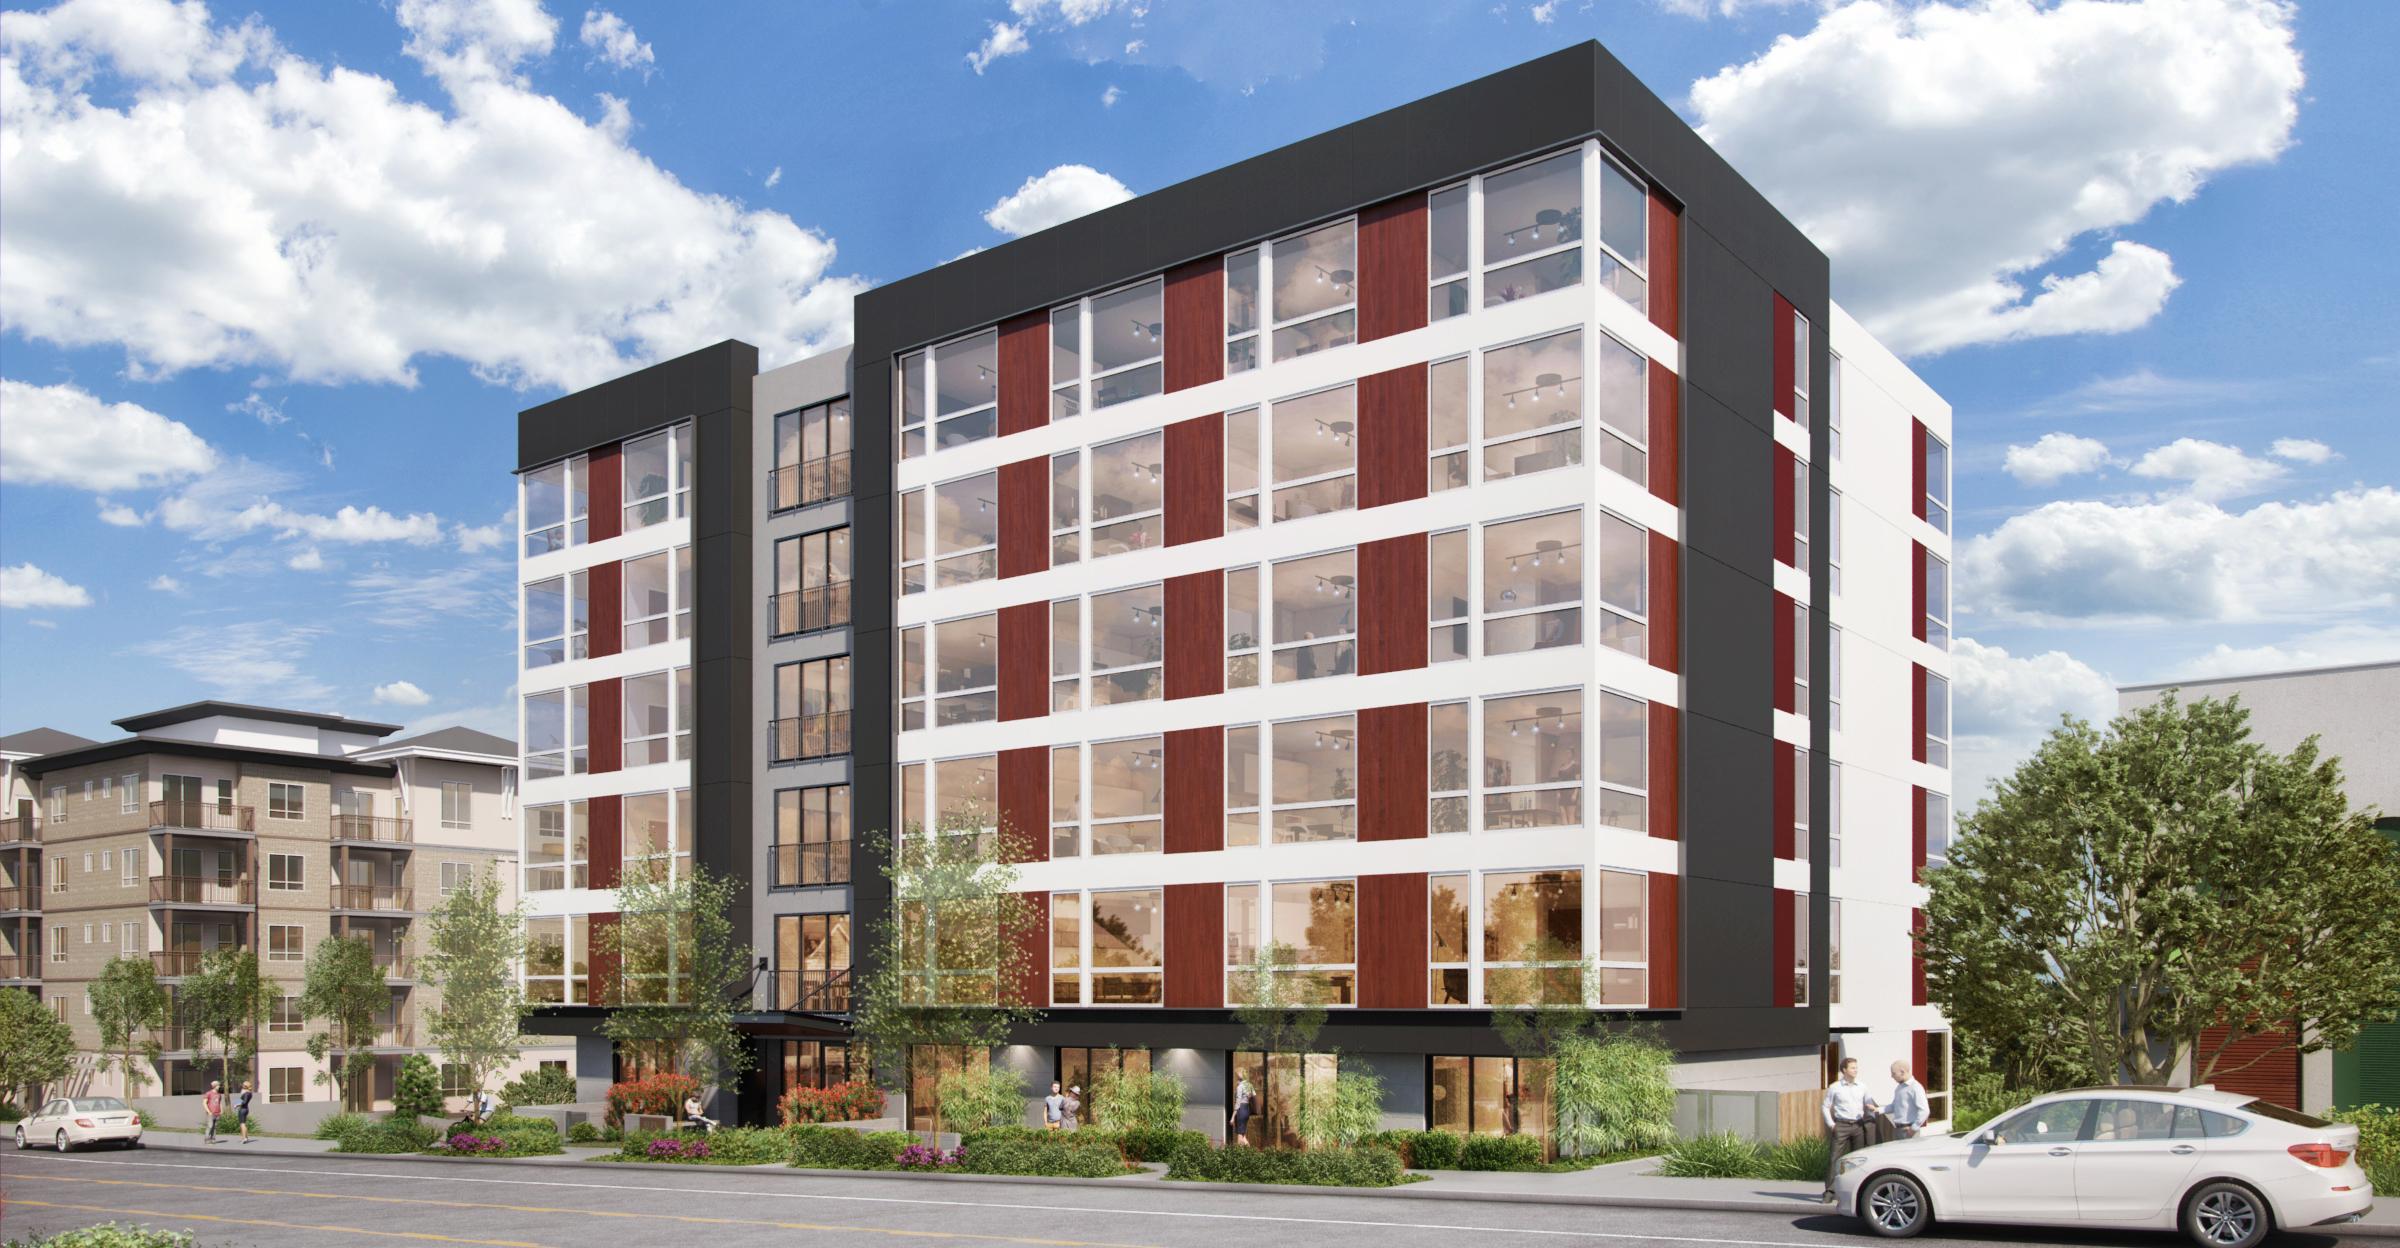 Avalon-West-development-seattle-apartment-team.jpg